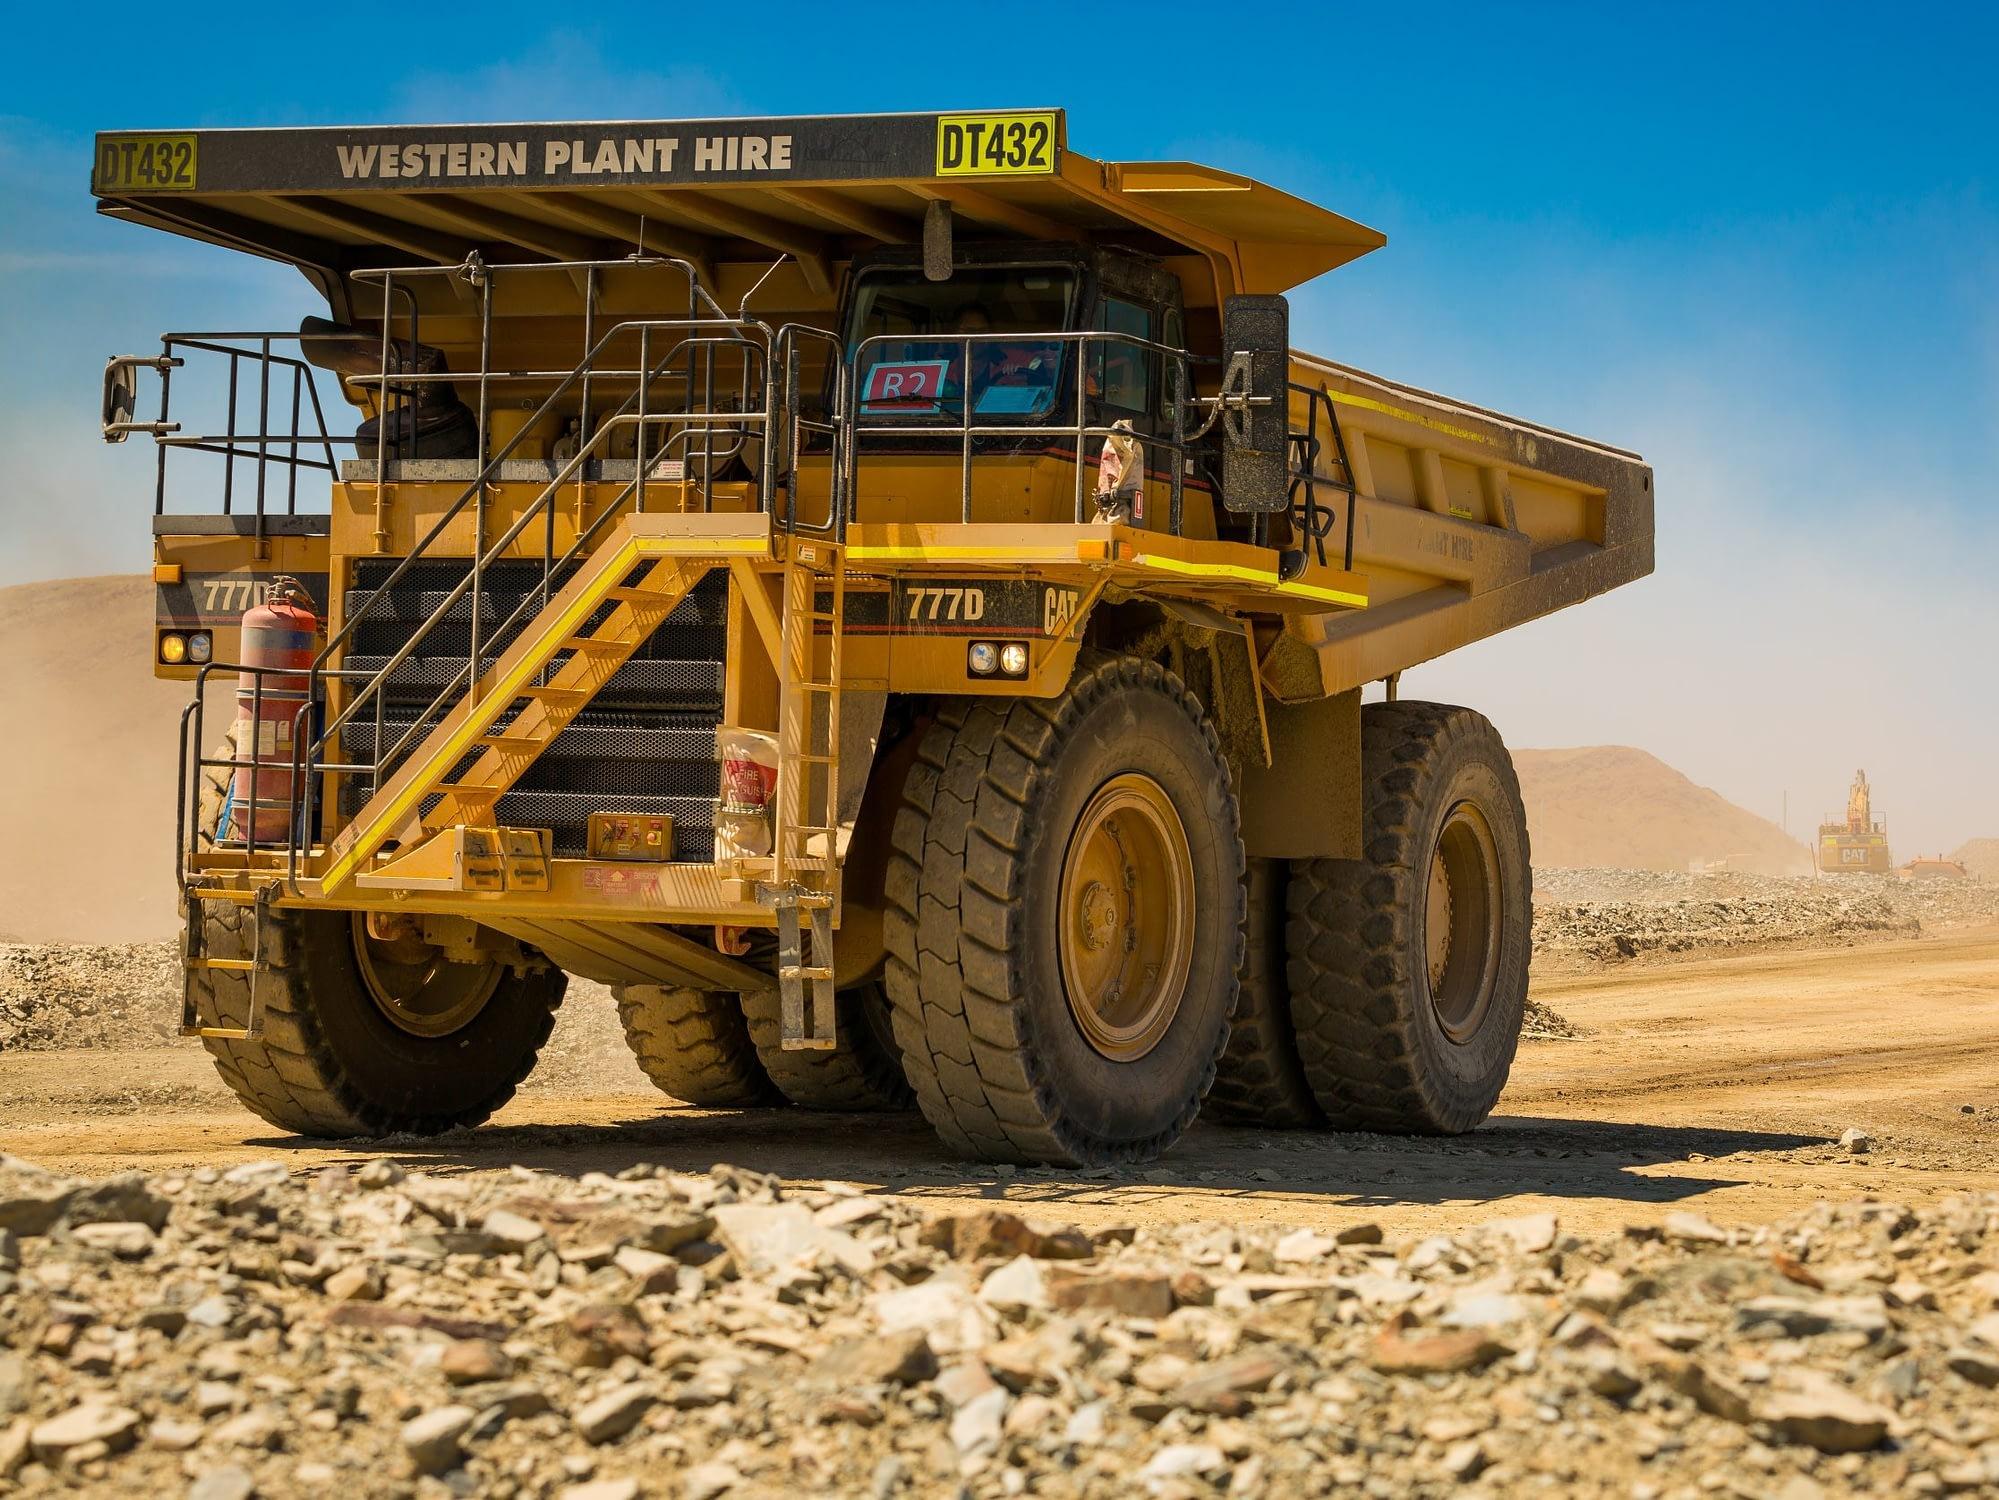 Caterpillar 777D Rigid Dump Truck - For Hire